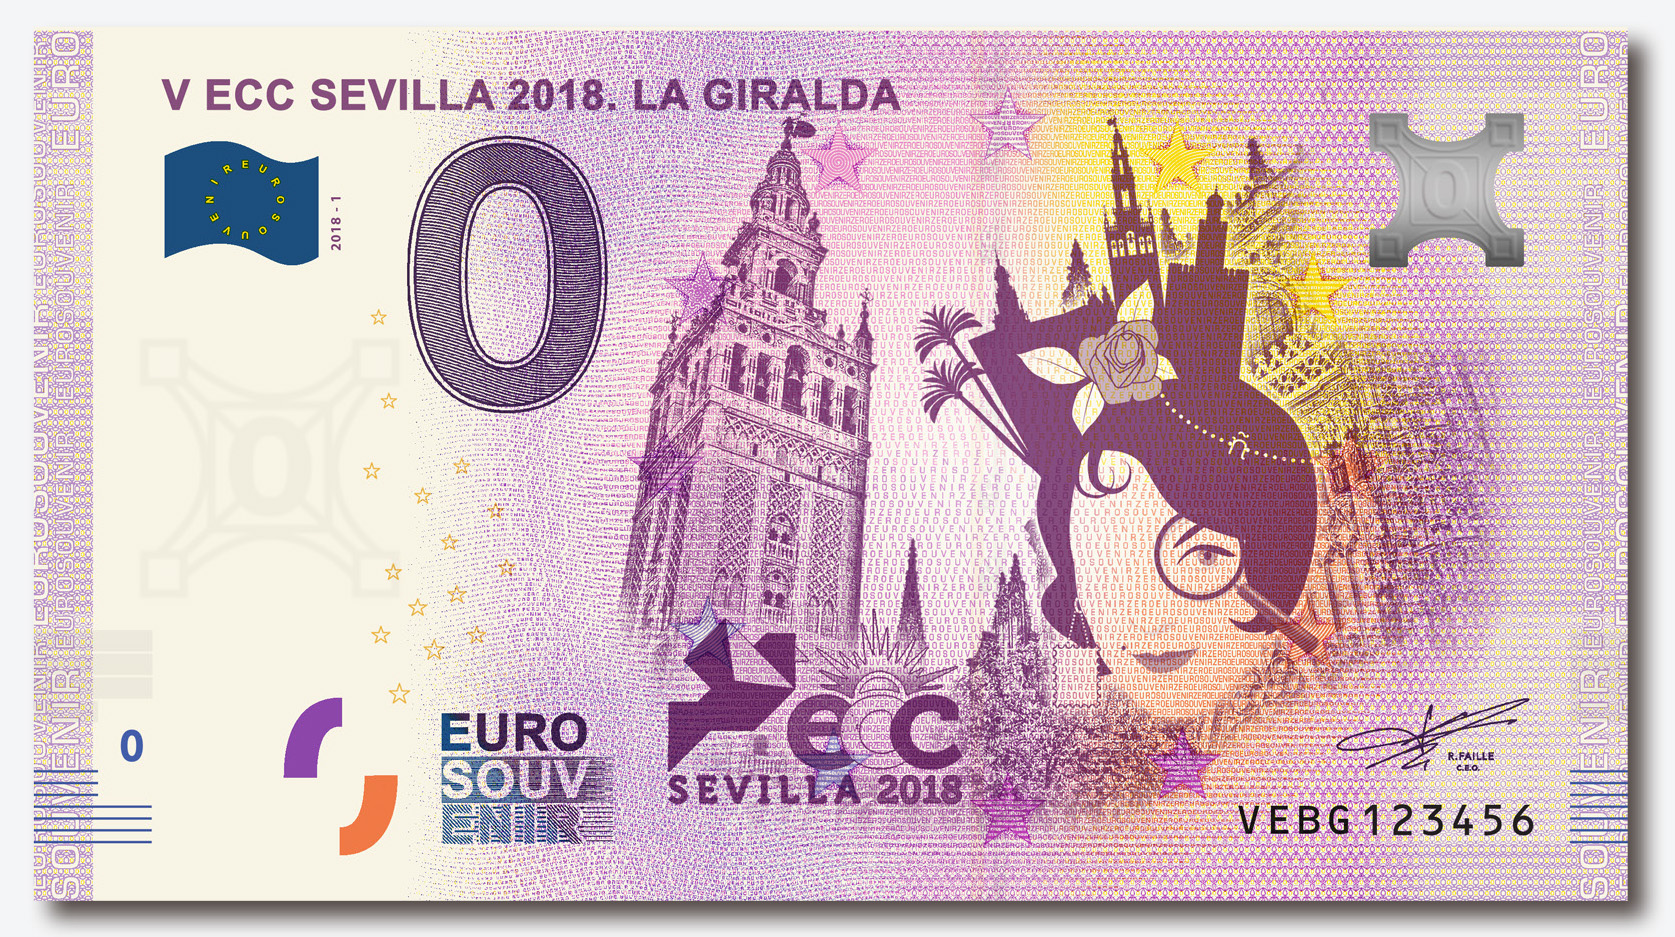 2018. ECC Sevilla 2018